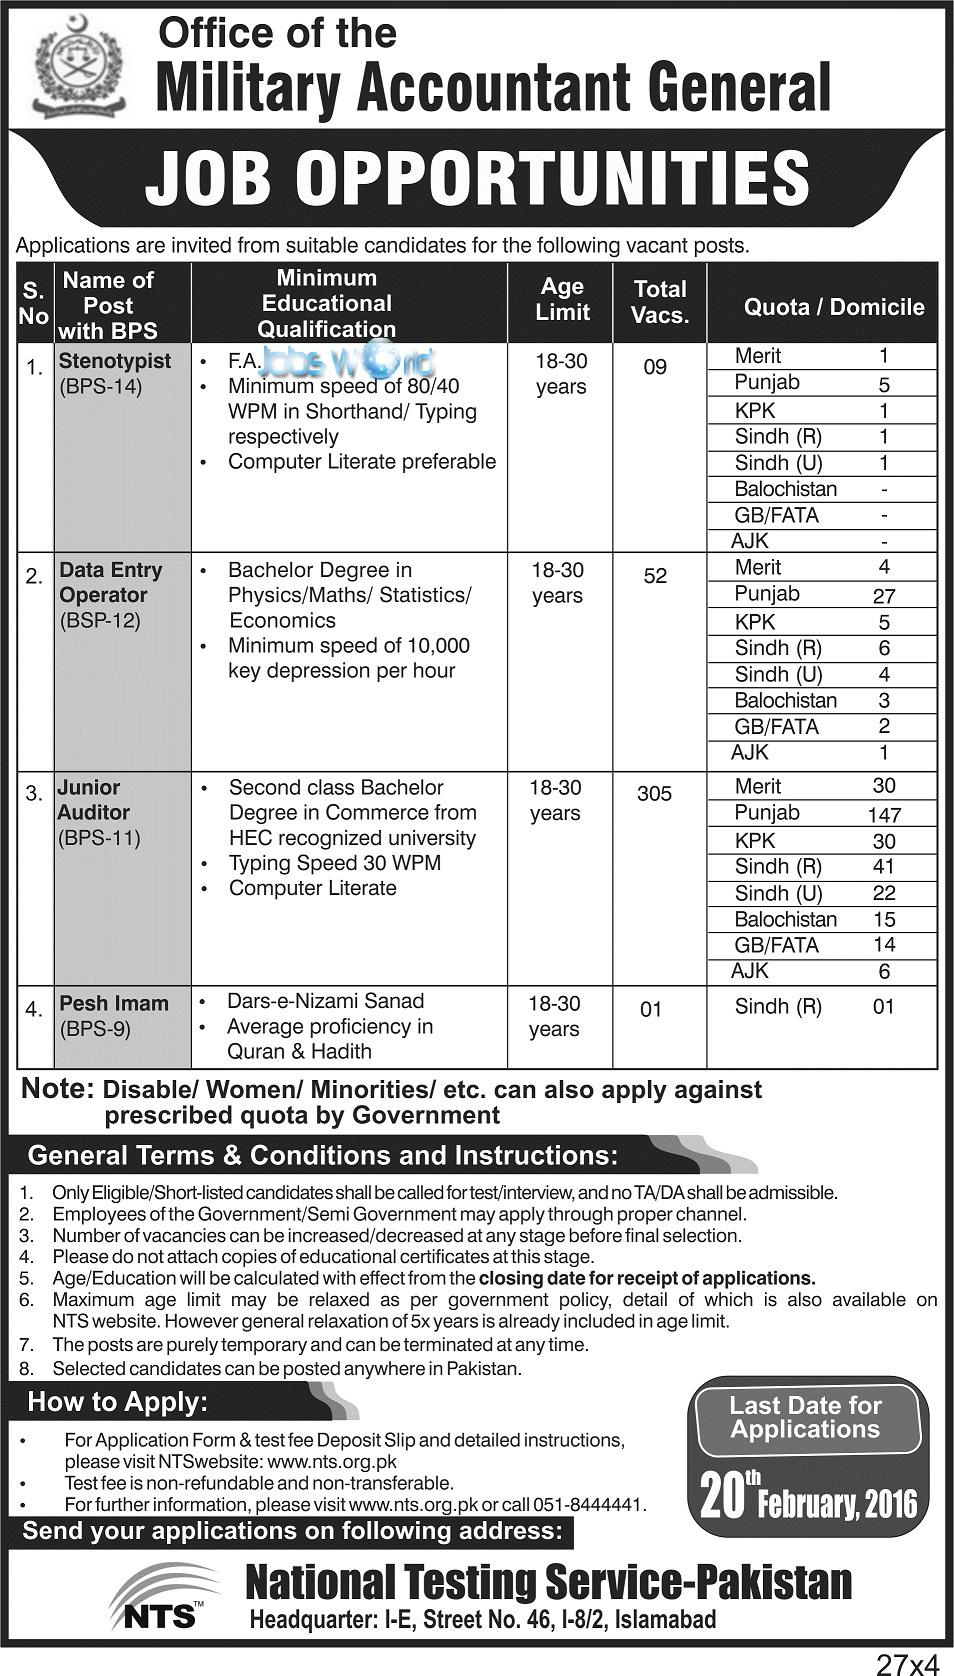 Pakistan Military Accountant General Jobs 2016 Nts